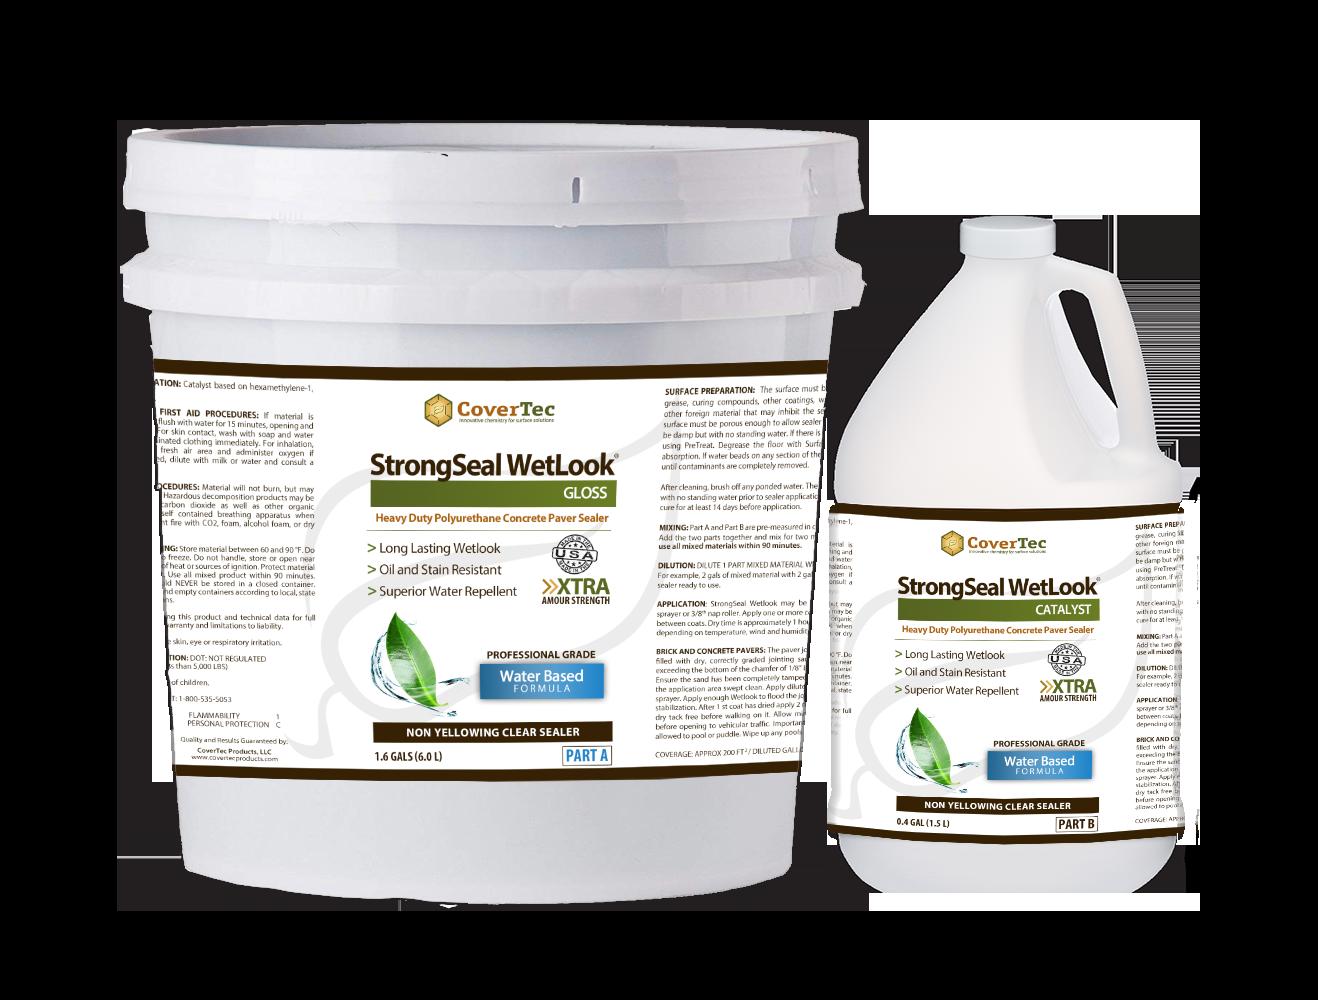 Strongseal Wetlook A Water Based Paver Sealer Wet Look Covertec